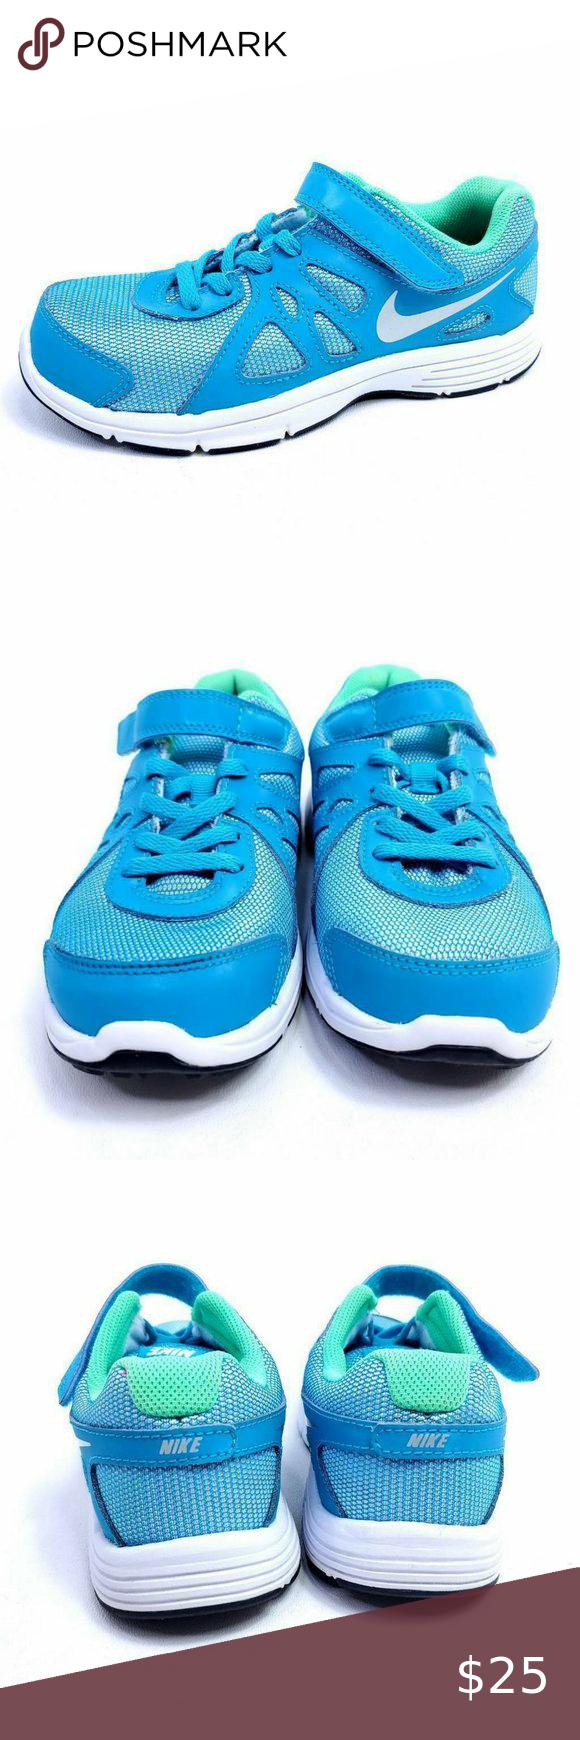 us 3y shoe size